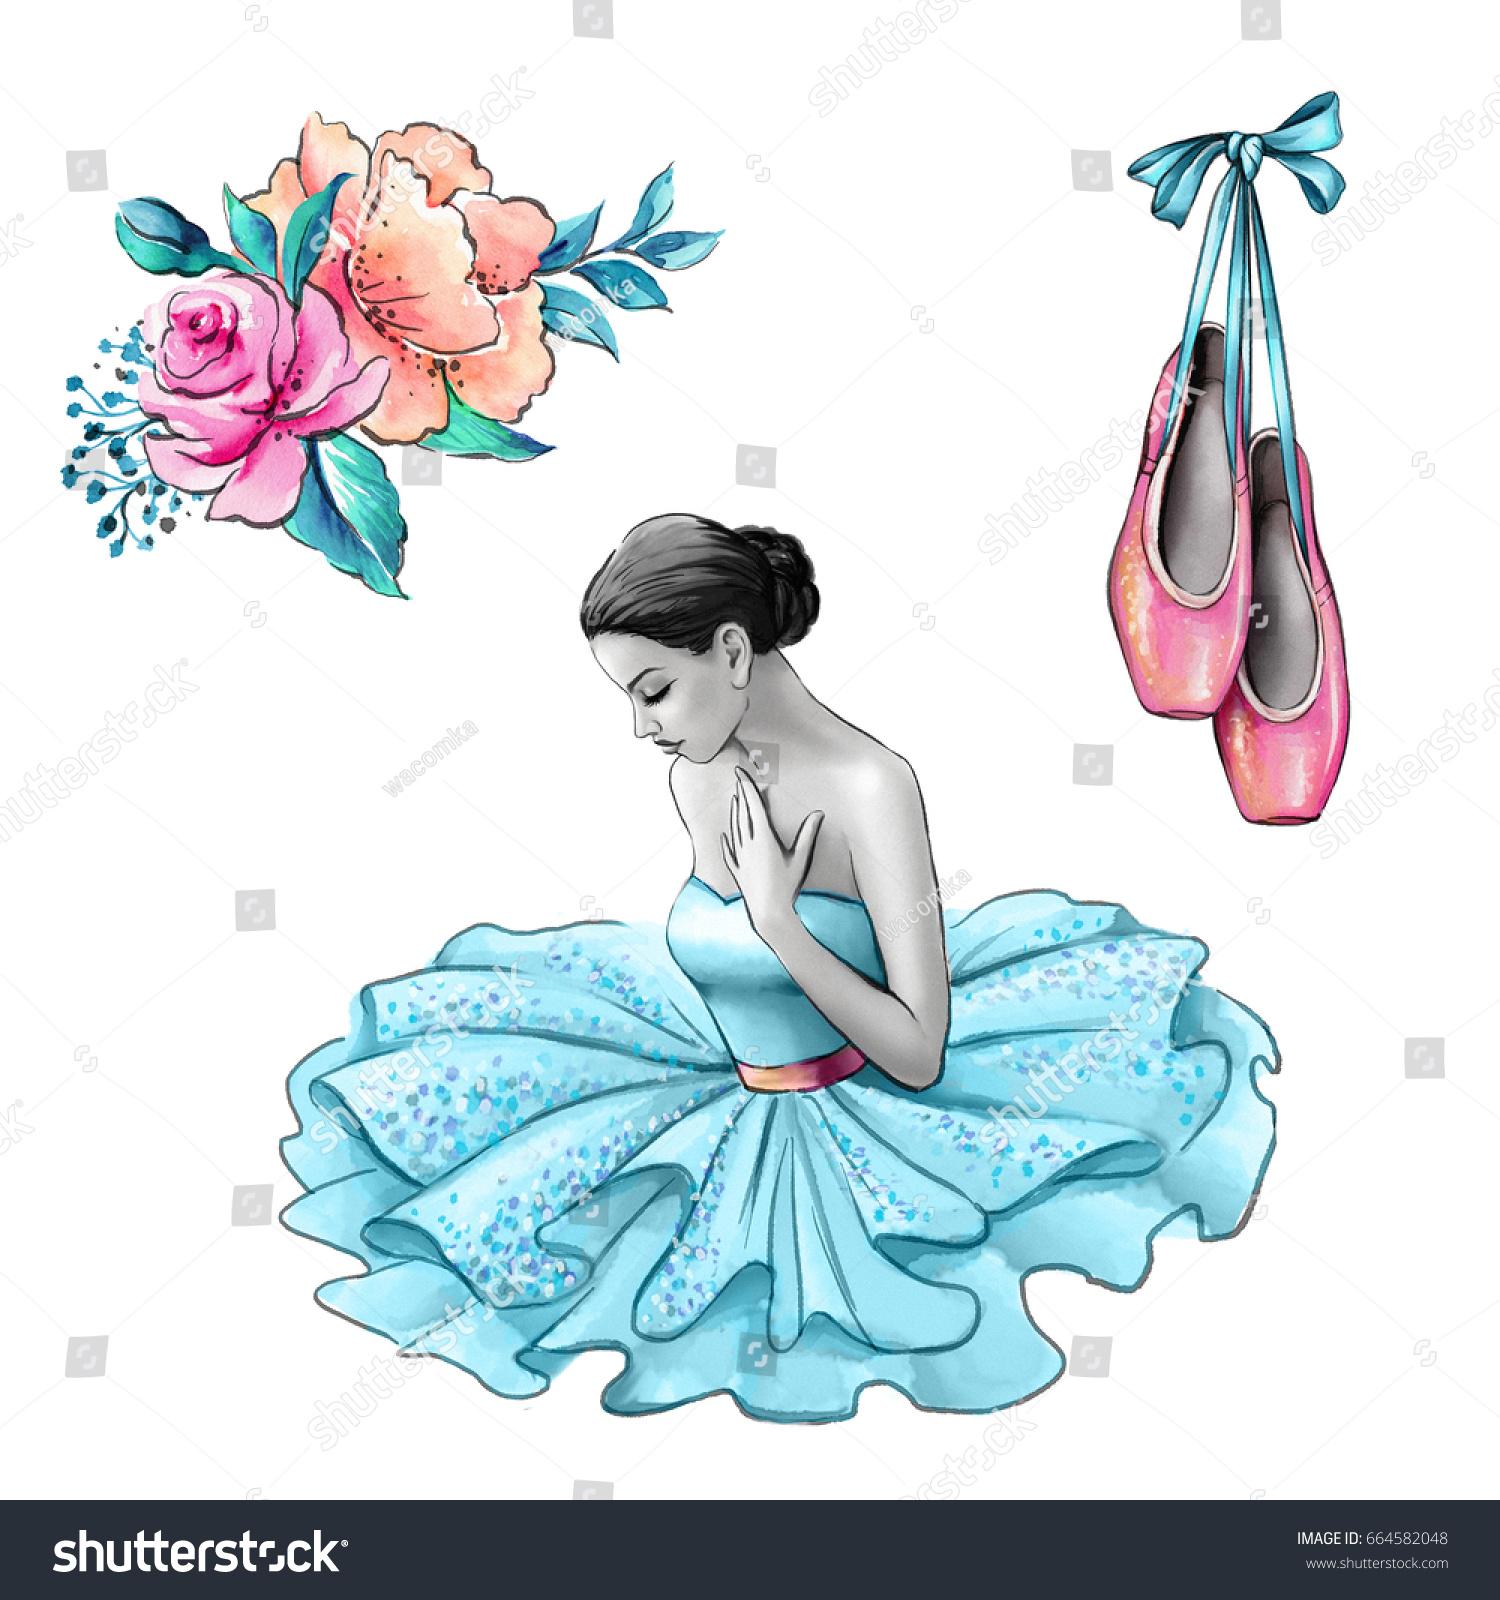 Watercolor Illustration Ballerina Blue Dress Flowers Stock